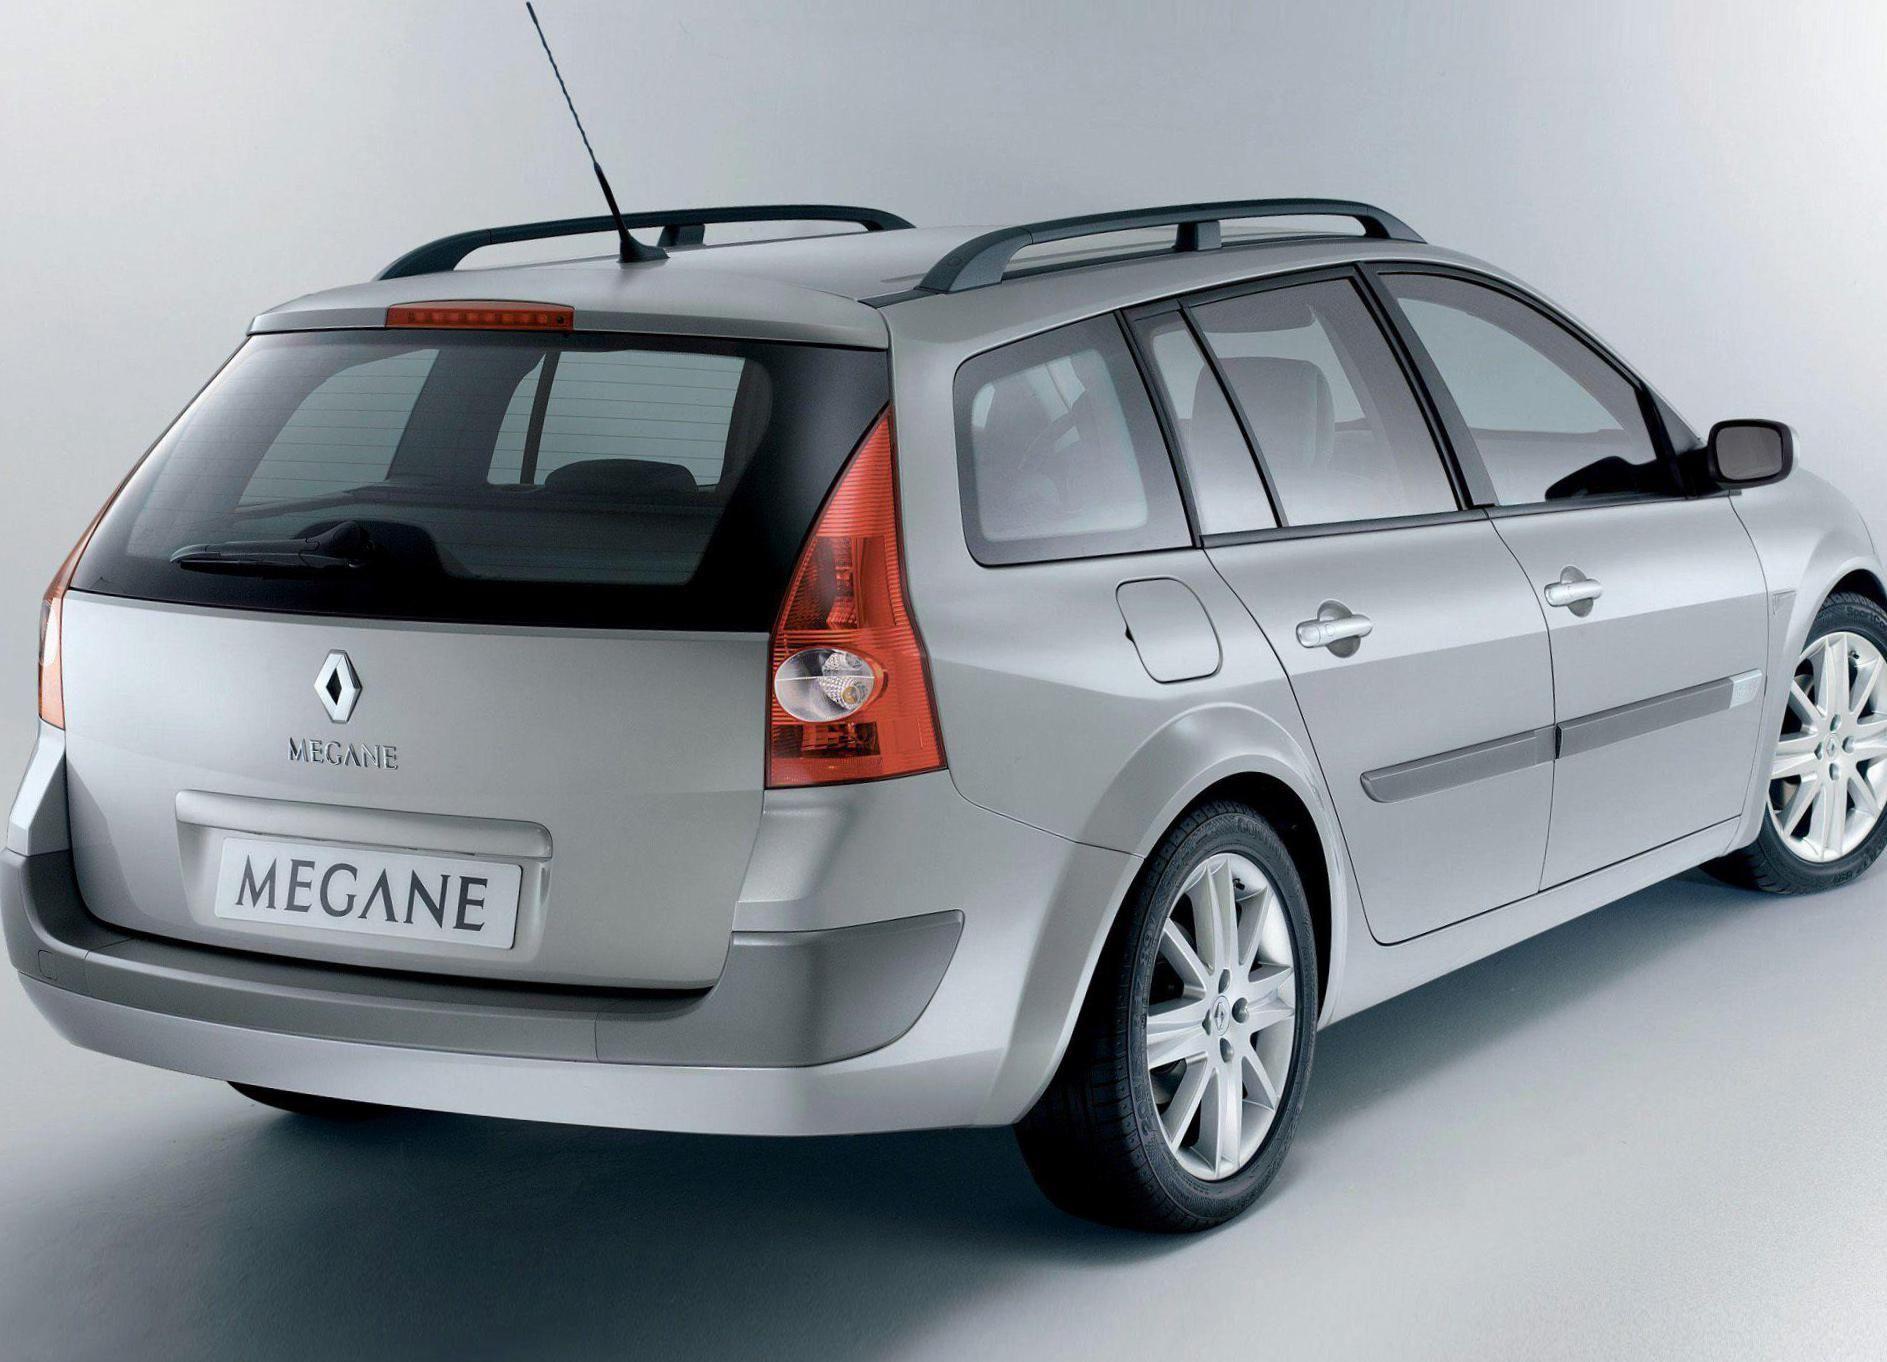 Megane Estate Renault Usa Http Autotras Com Renault Renault Megane Automobile